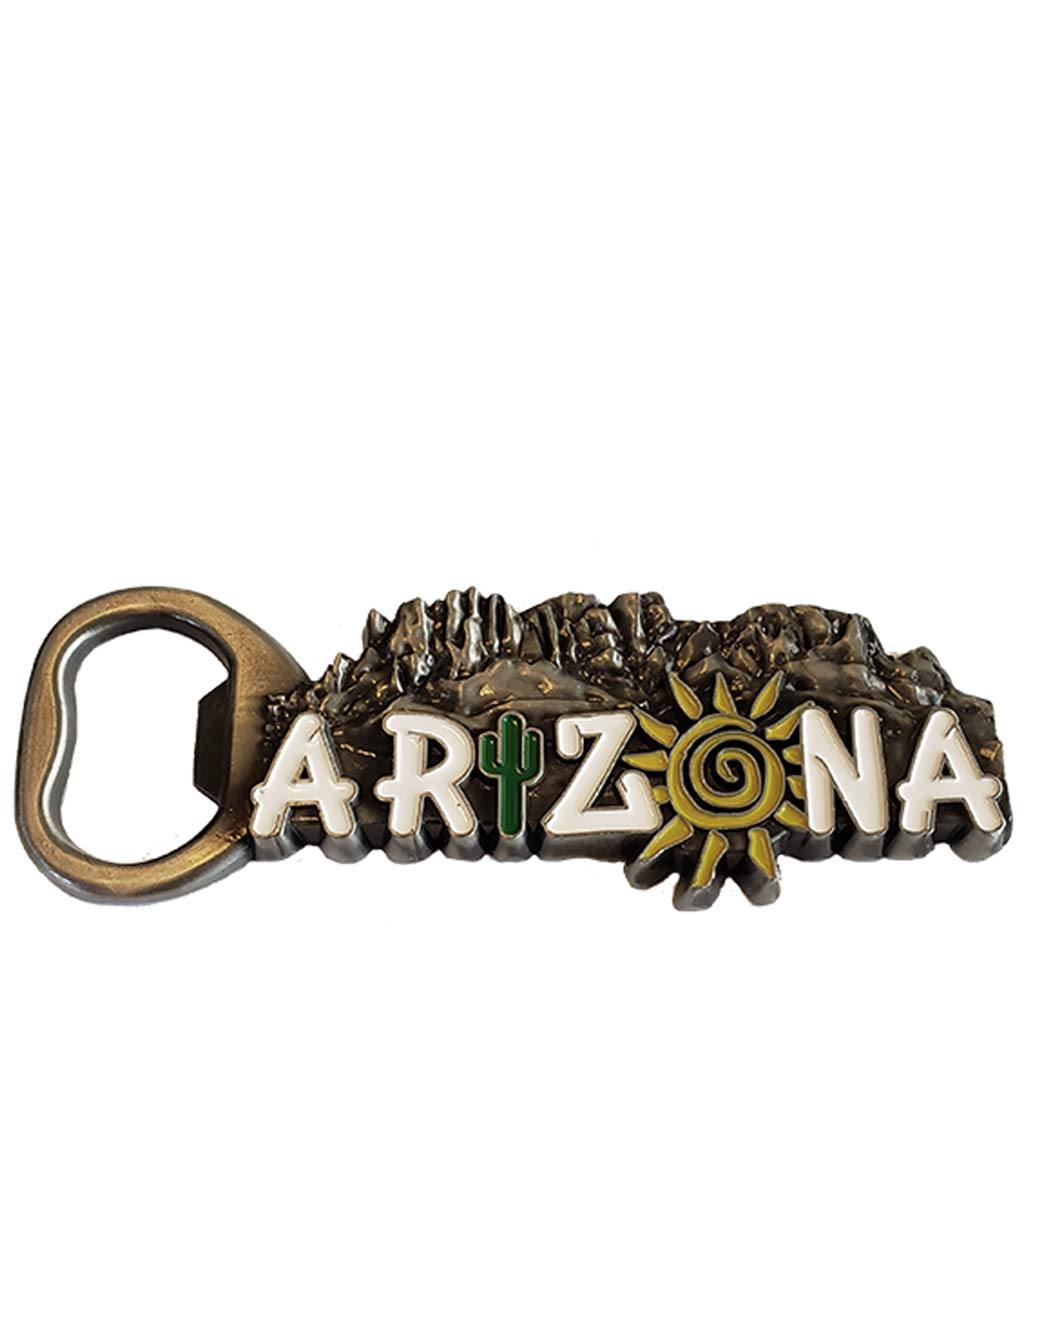 Arizona Bottle Opener Magnet (Silver) Decorative Metal Refrigerator Magnet Southwest Beer Lover Gift Idea - Arizona Souvenir